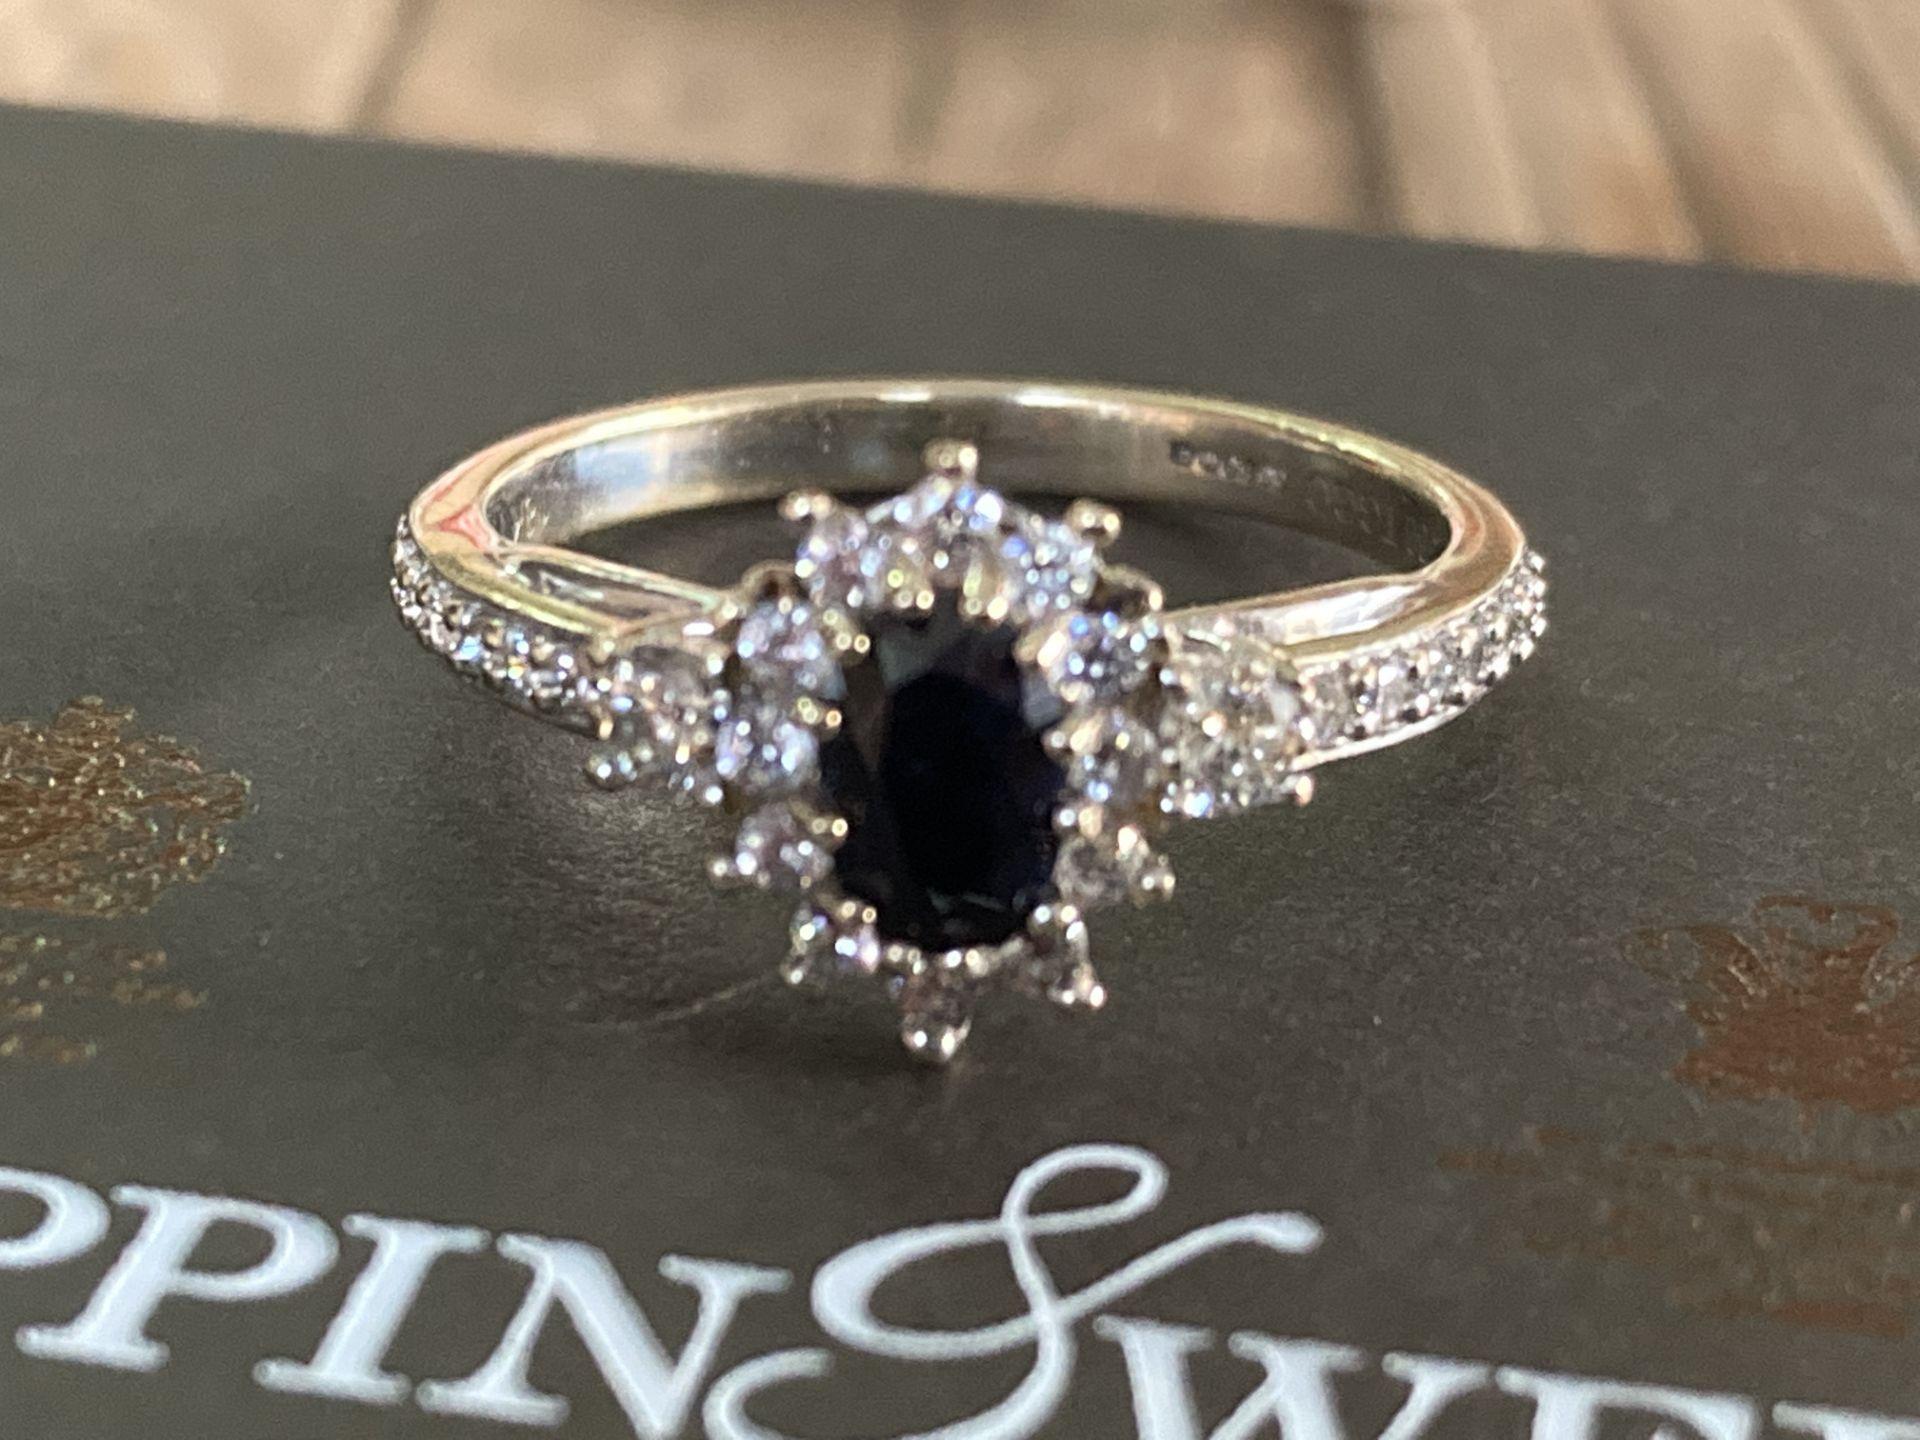 18K GOLD DIAMOND & SAPPHIRE RING - SIZE N /12